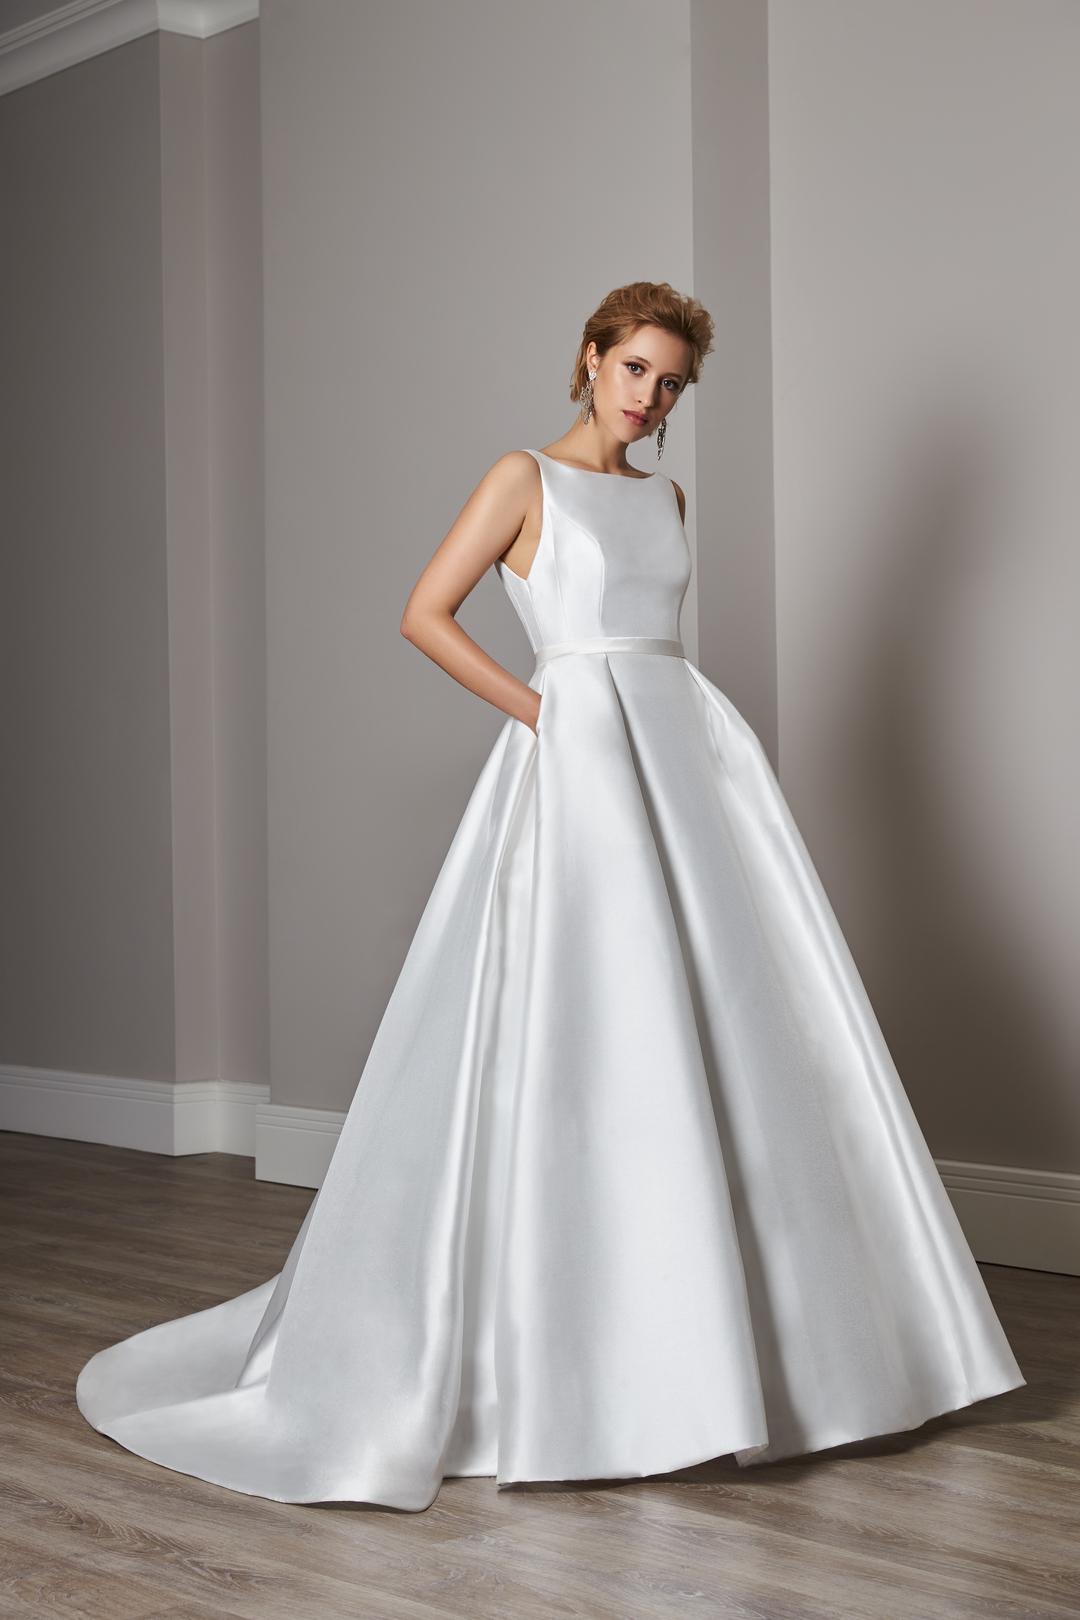 elizabeth dress photo